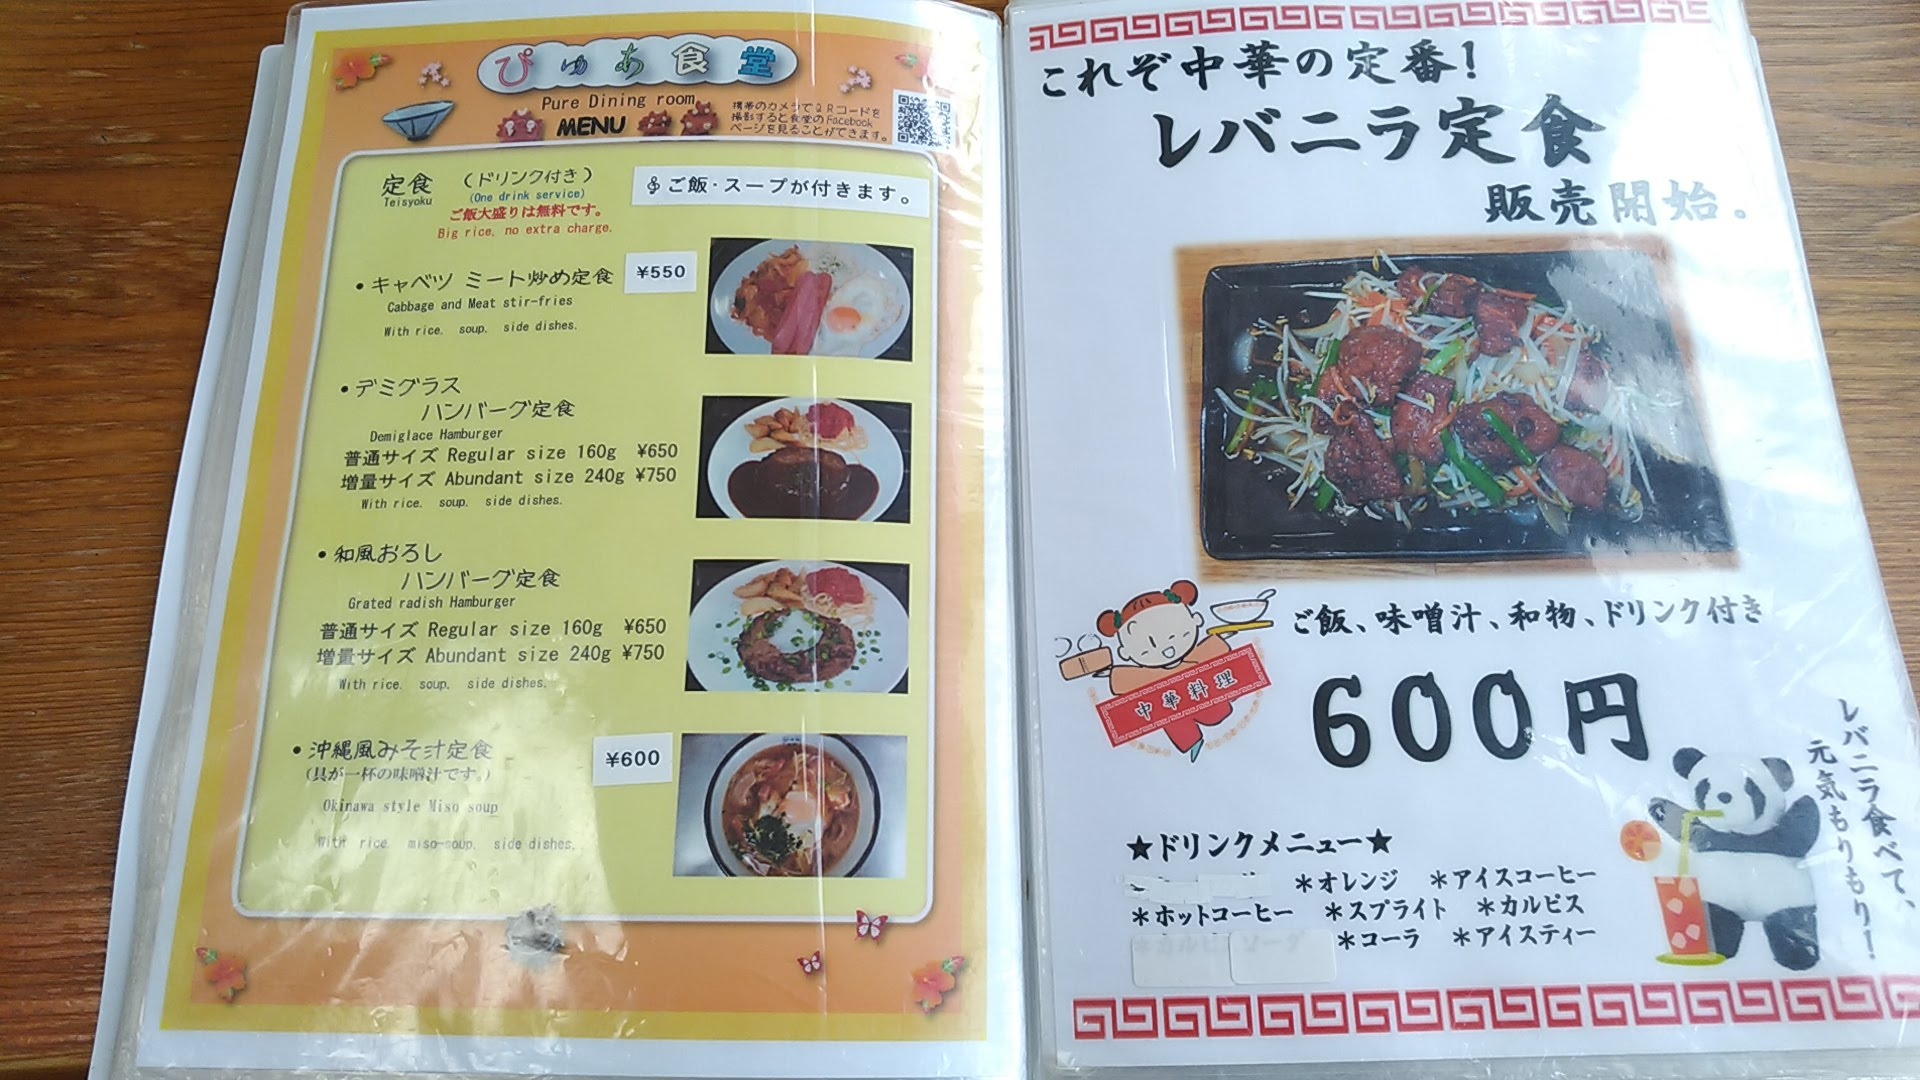 the menu of Pure shokudou 1